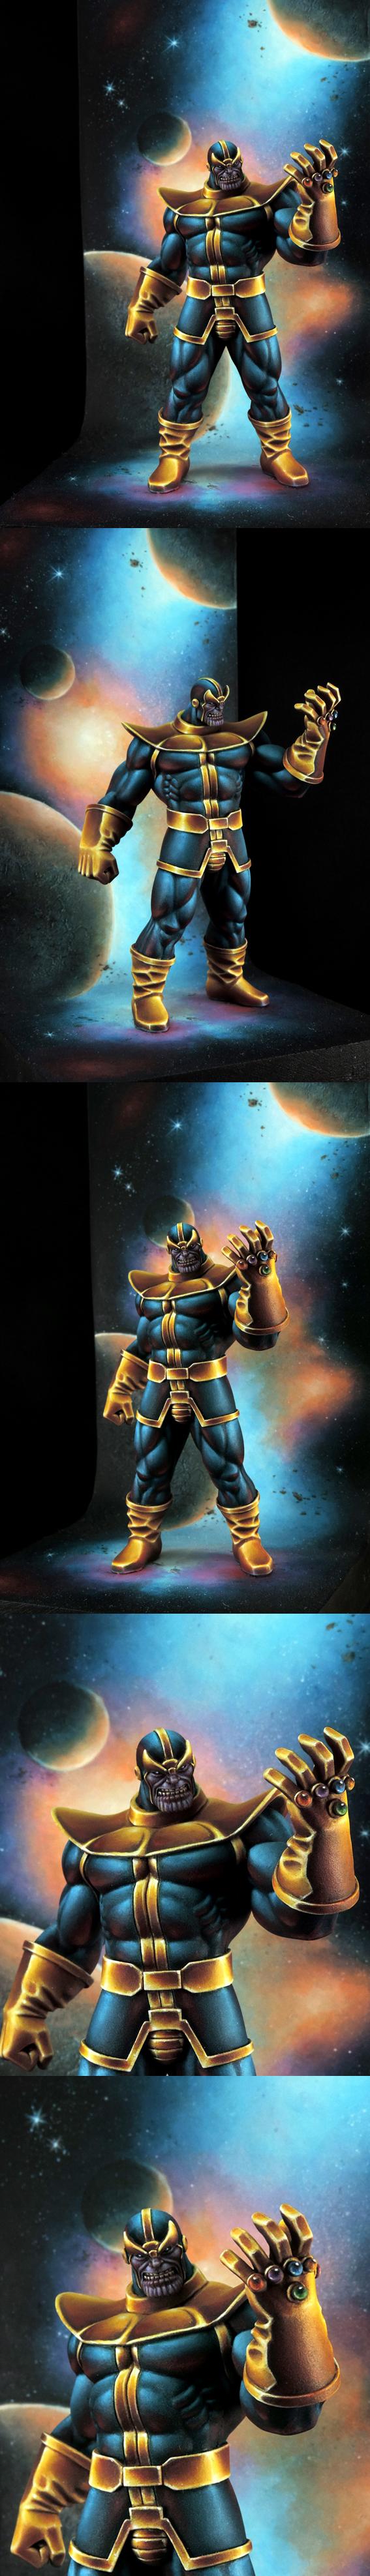 Thanos , the mad Titan